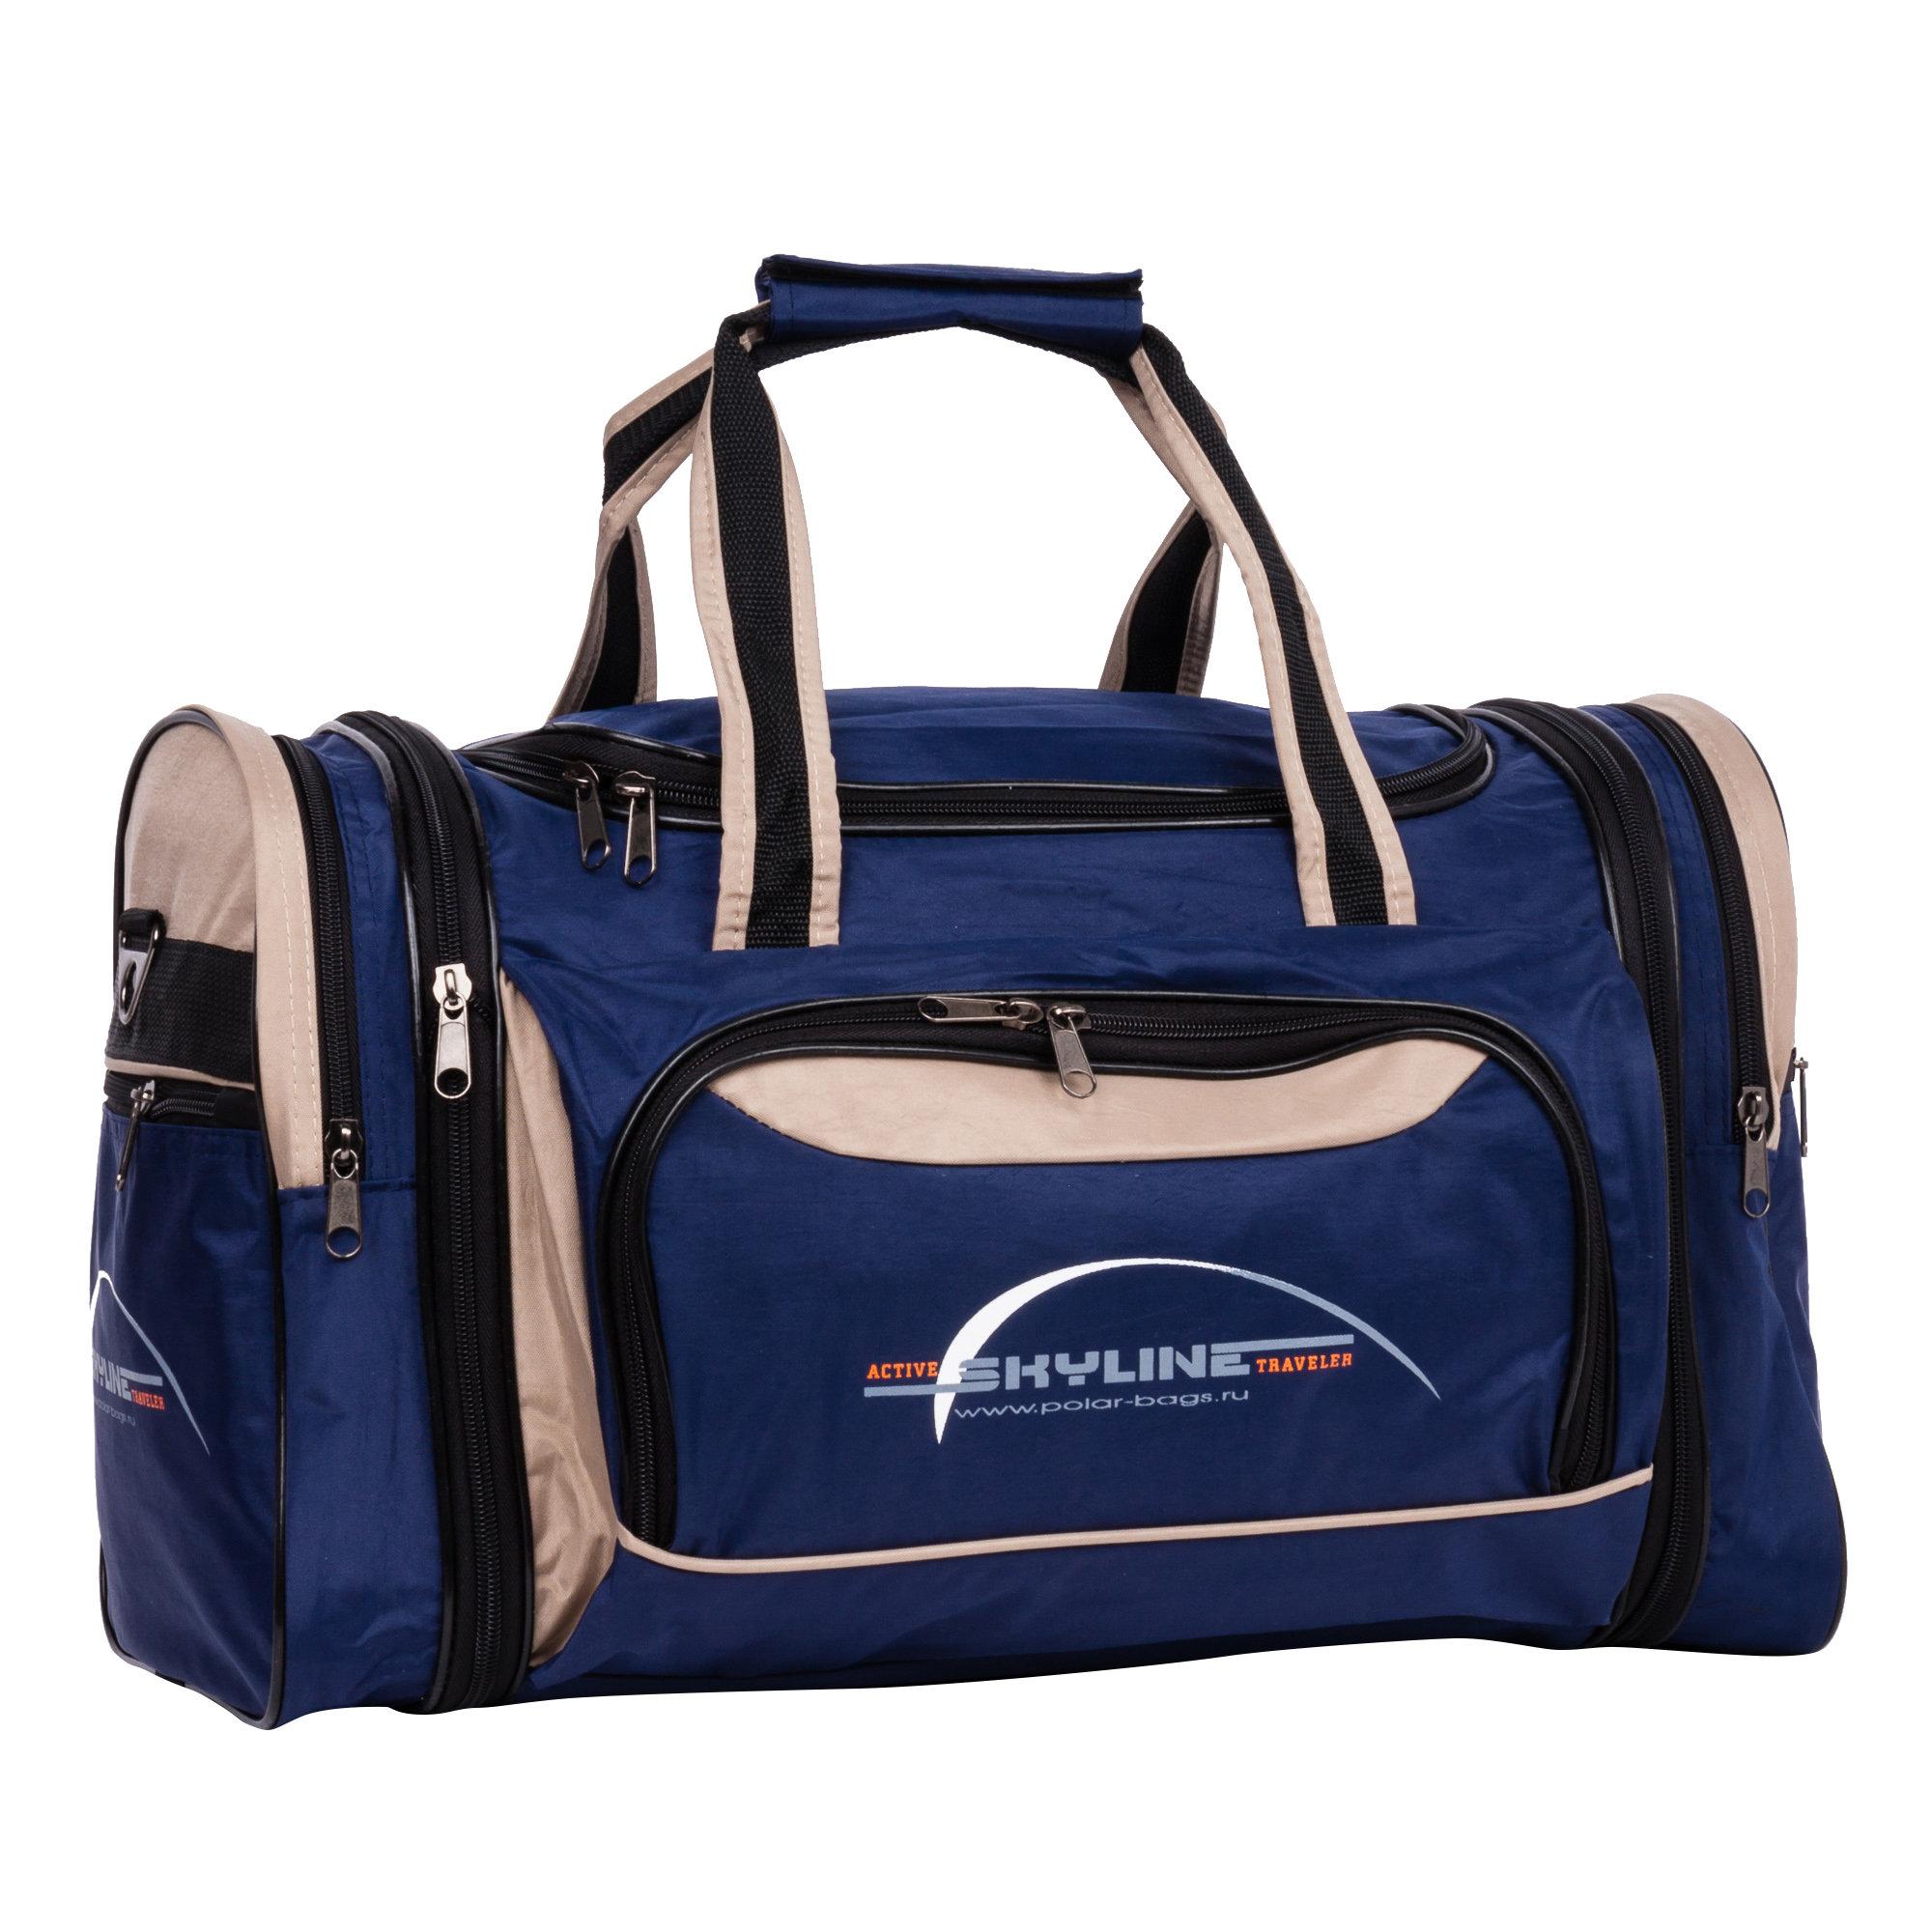 Спортивная сумка Polar 6067-1 38 бежевый